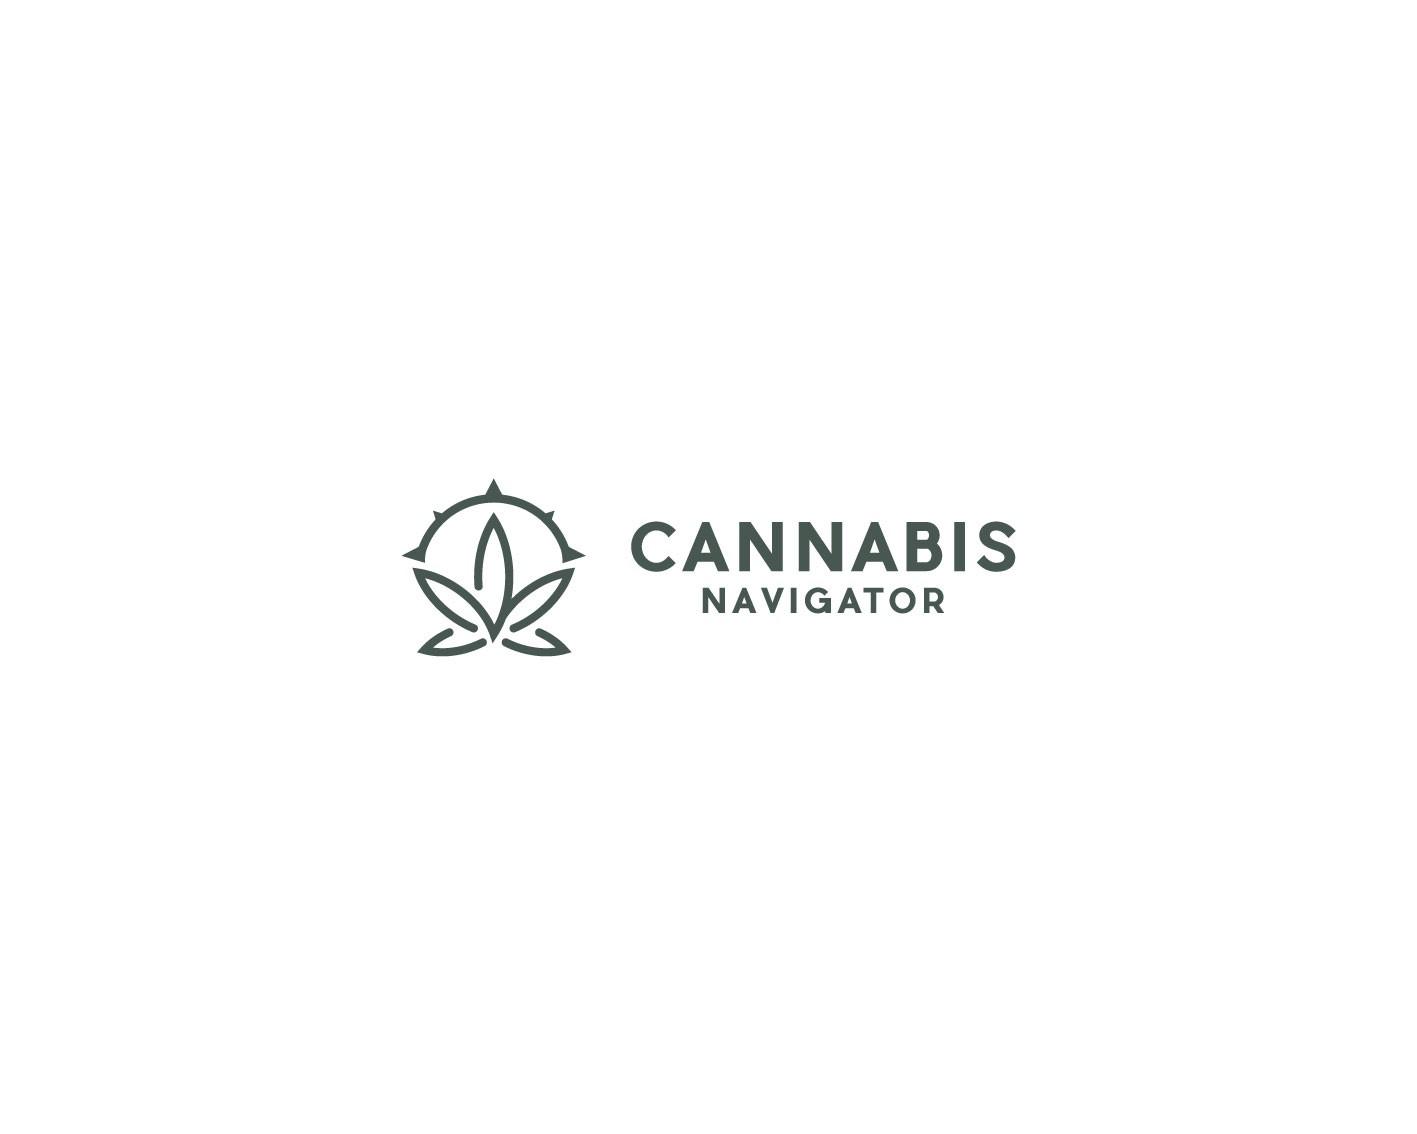 Cannabis Navigator : evidence-based cannabis information website needs a logo